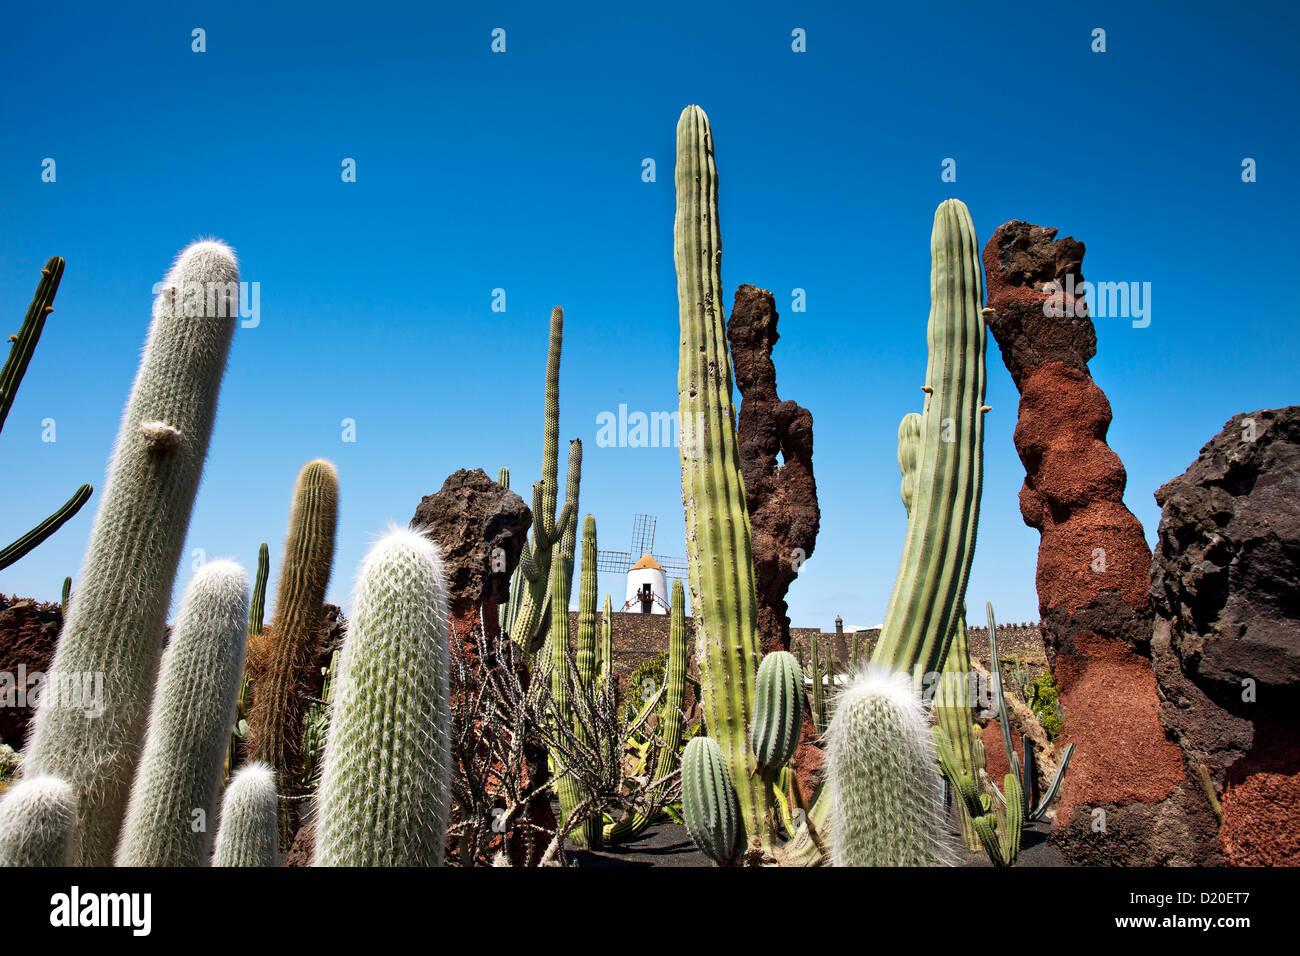 Windmill and cacti, botanical garden, Jardin de Cactus, architect Cesar Manrique, Guatiza, Lanzarote, Canary Islands, - Stock Image